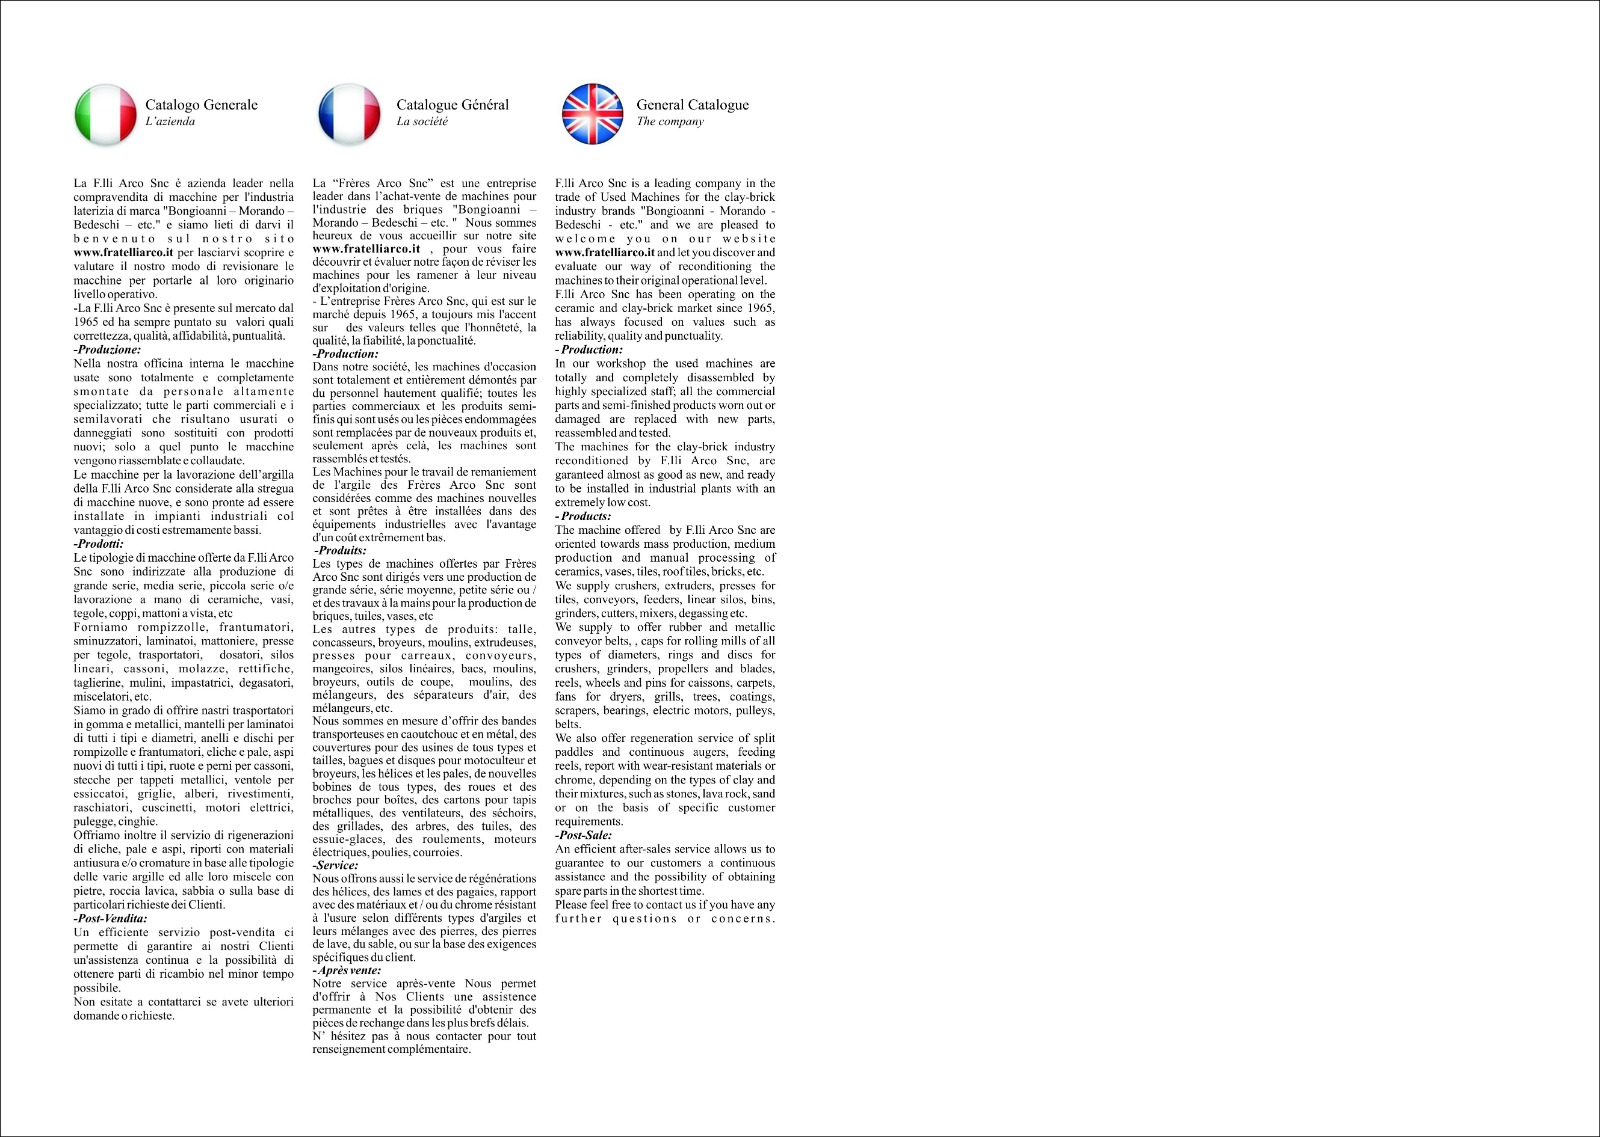 Catalogo F.LLI ARCO snc